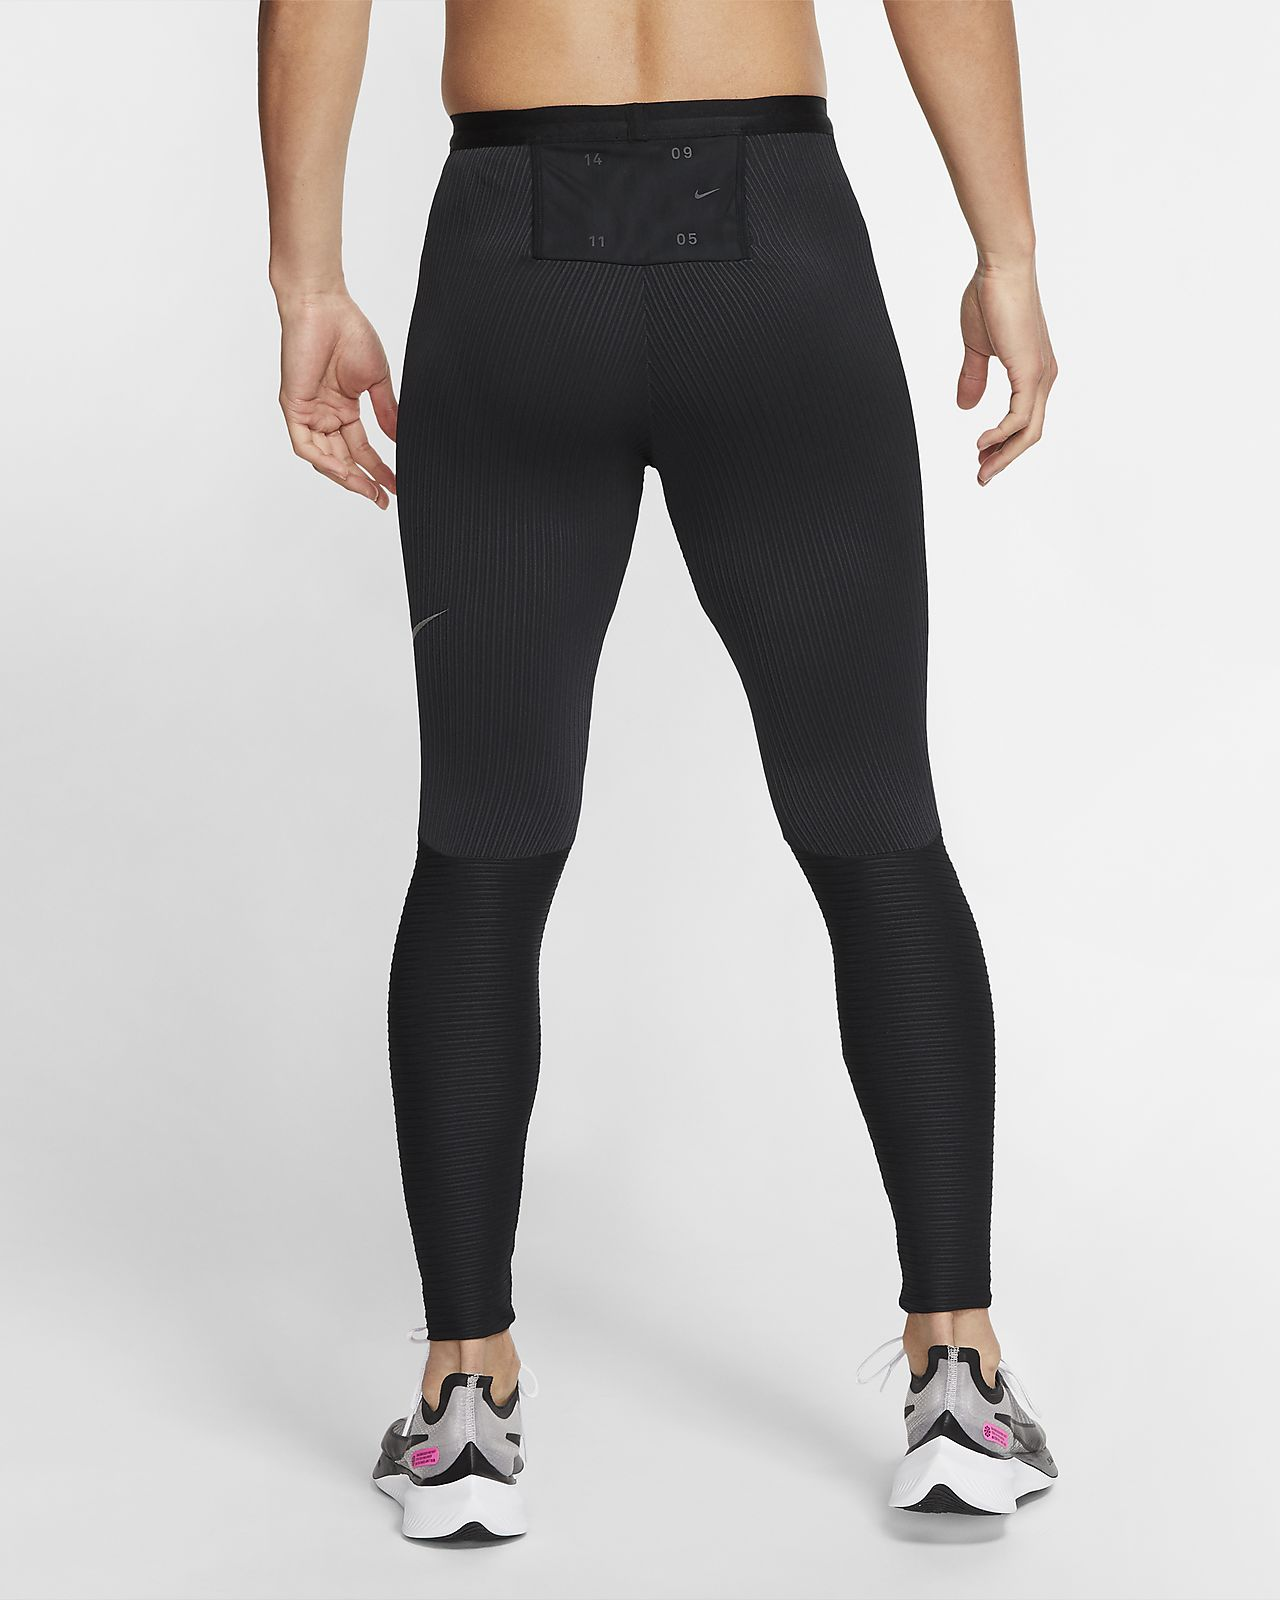 Black More Mile Girls Long Running Tights